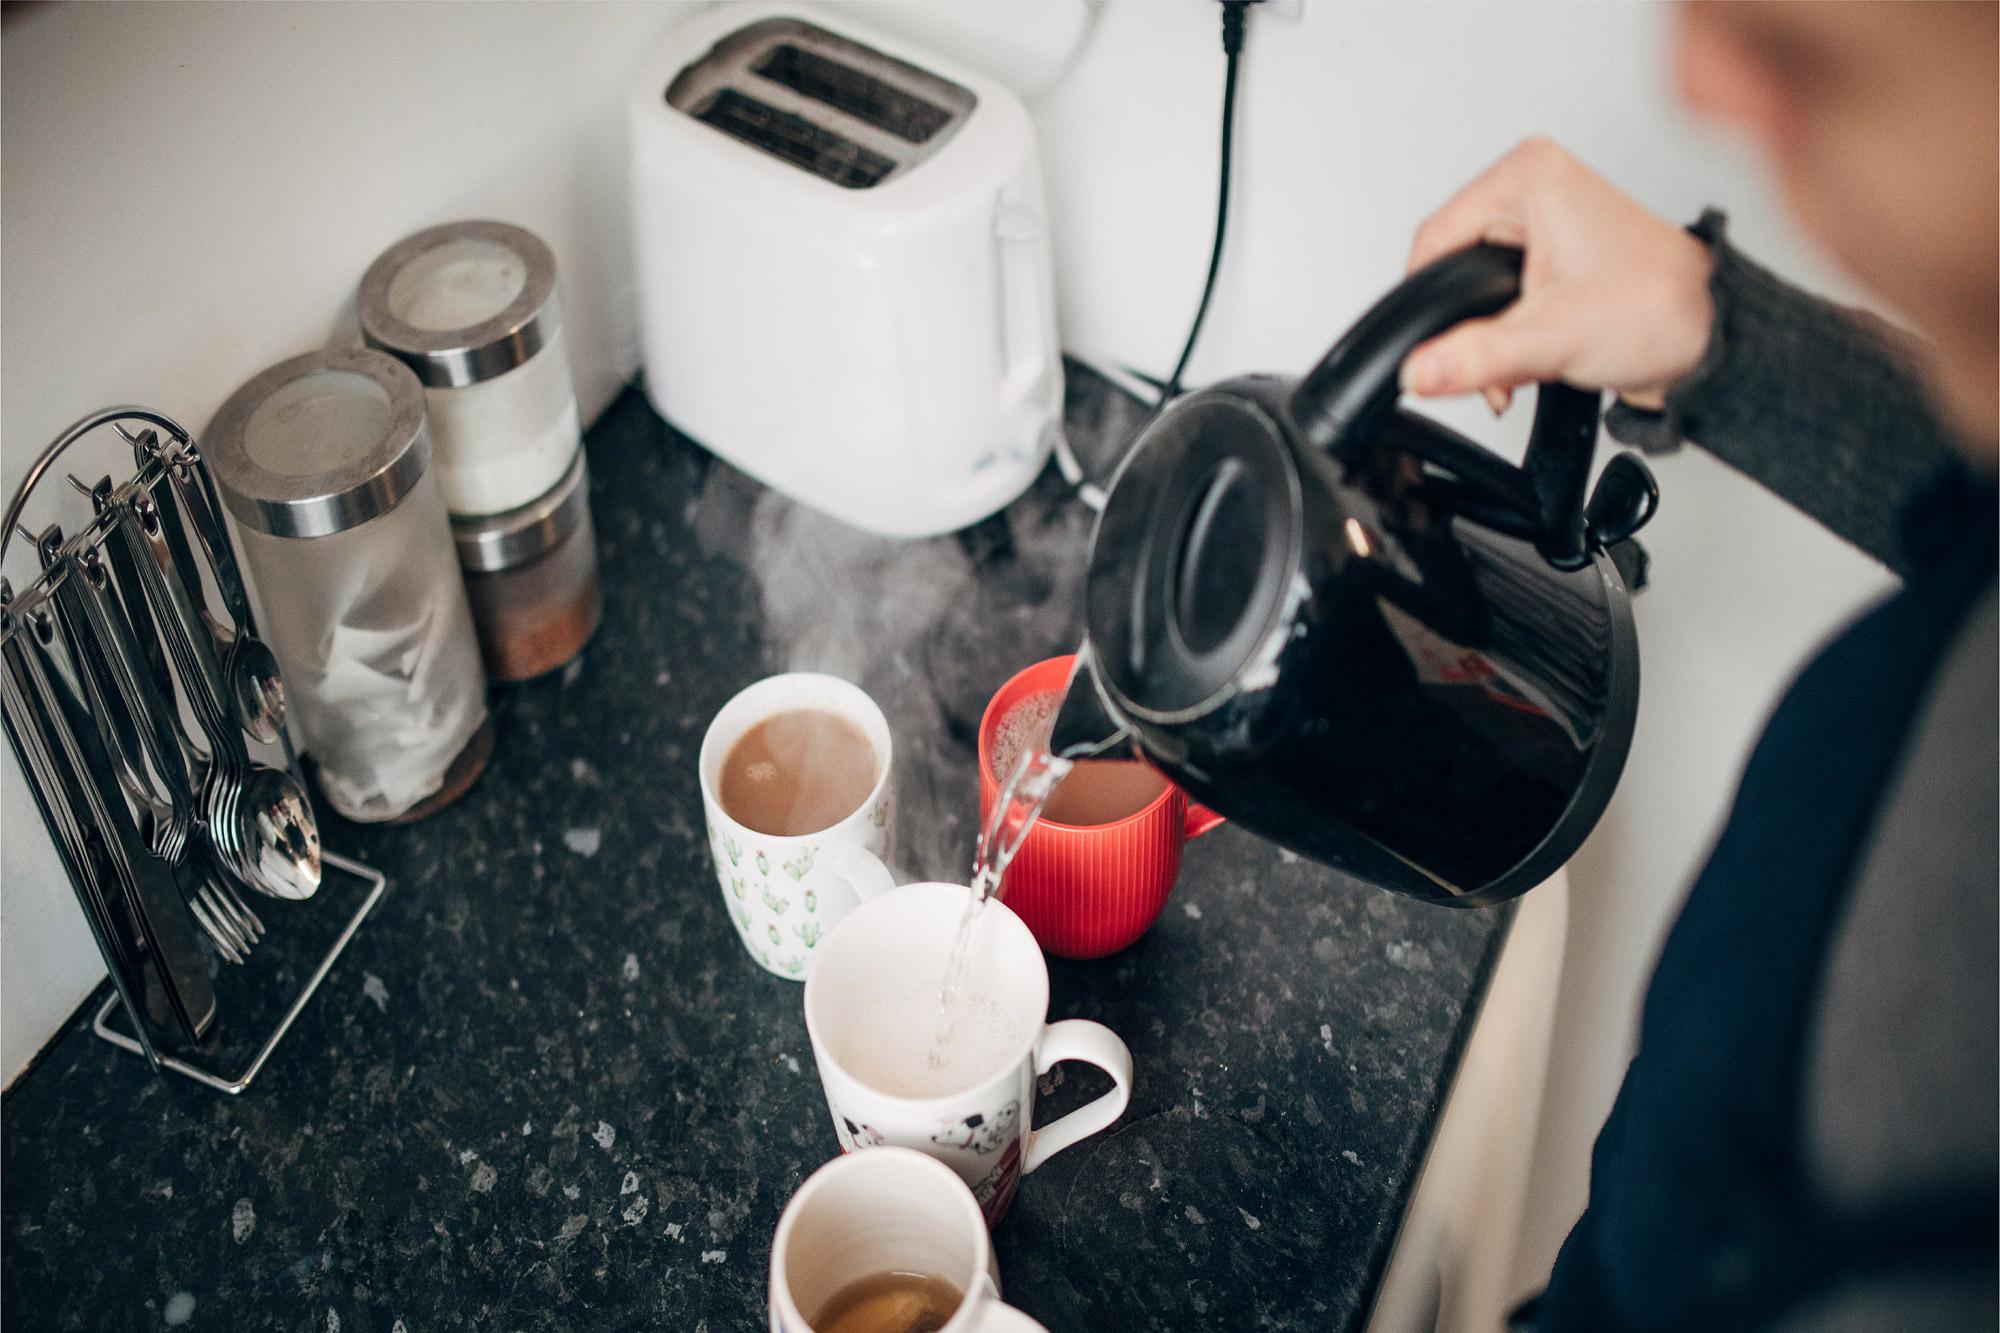 Brits spend twice as long making tea per week as exercising